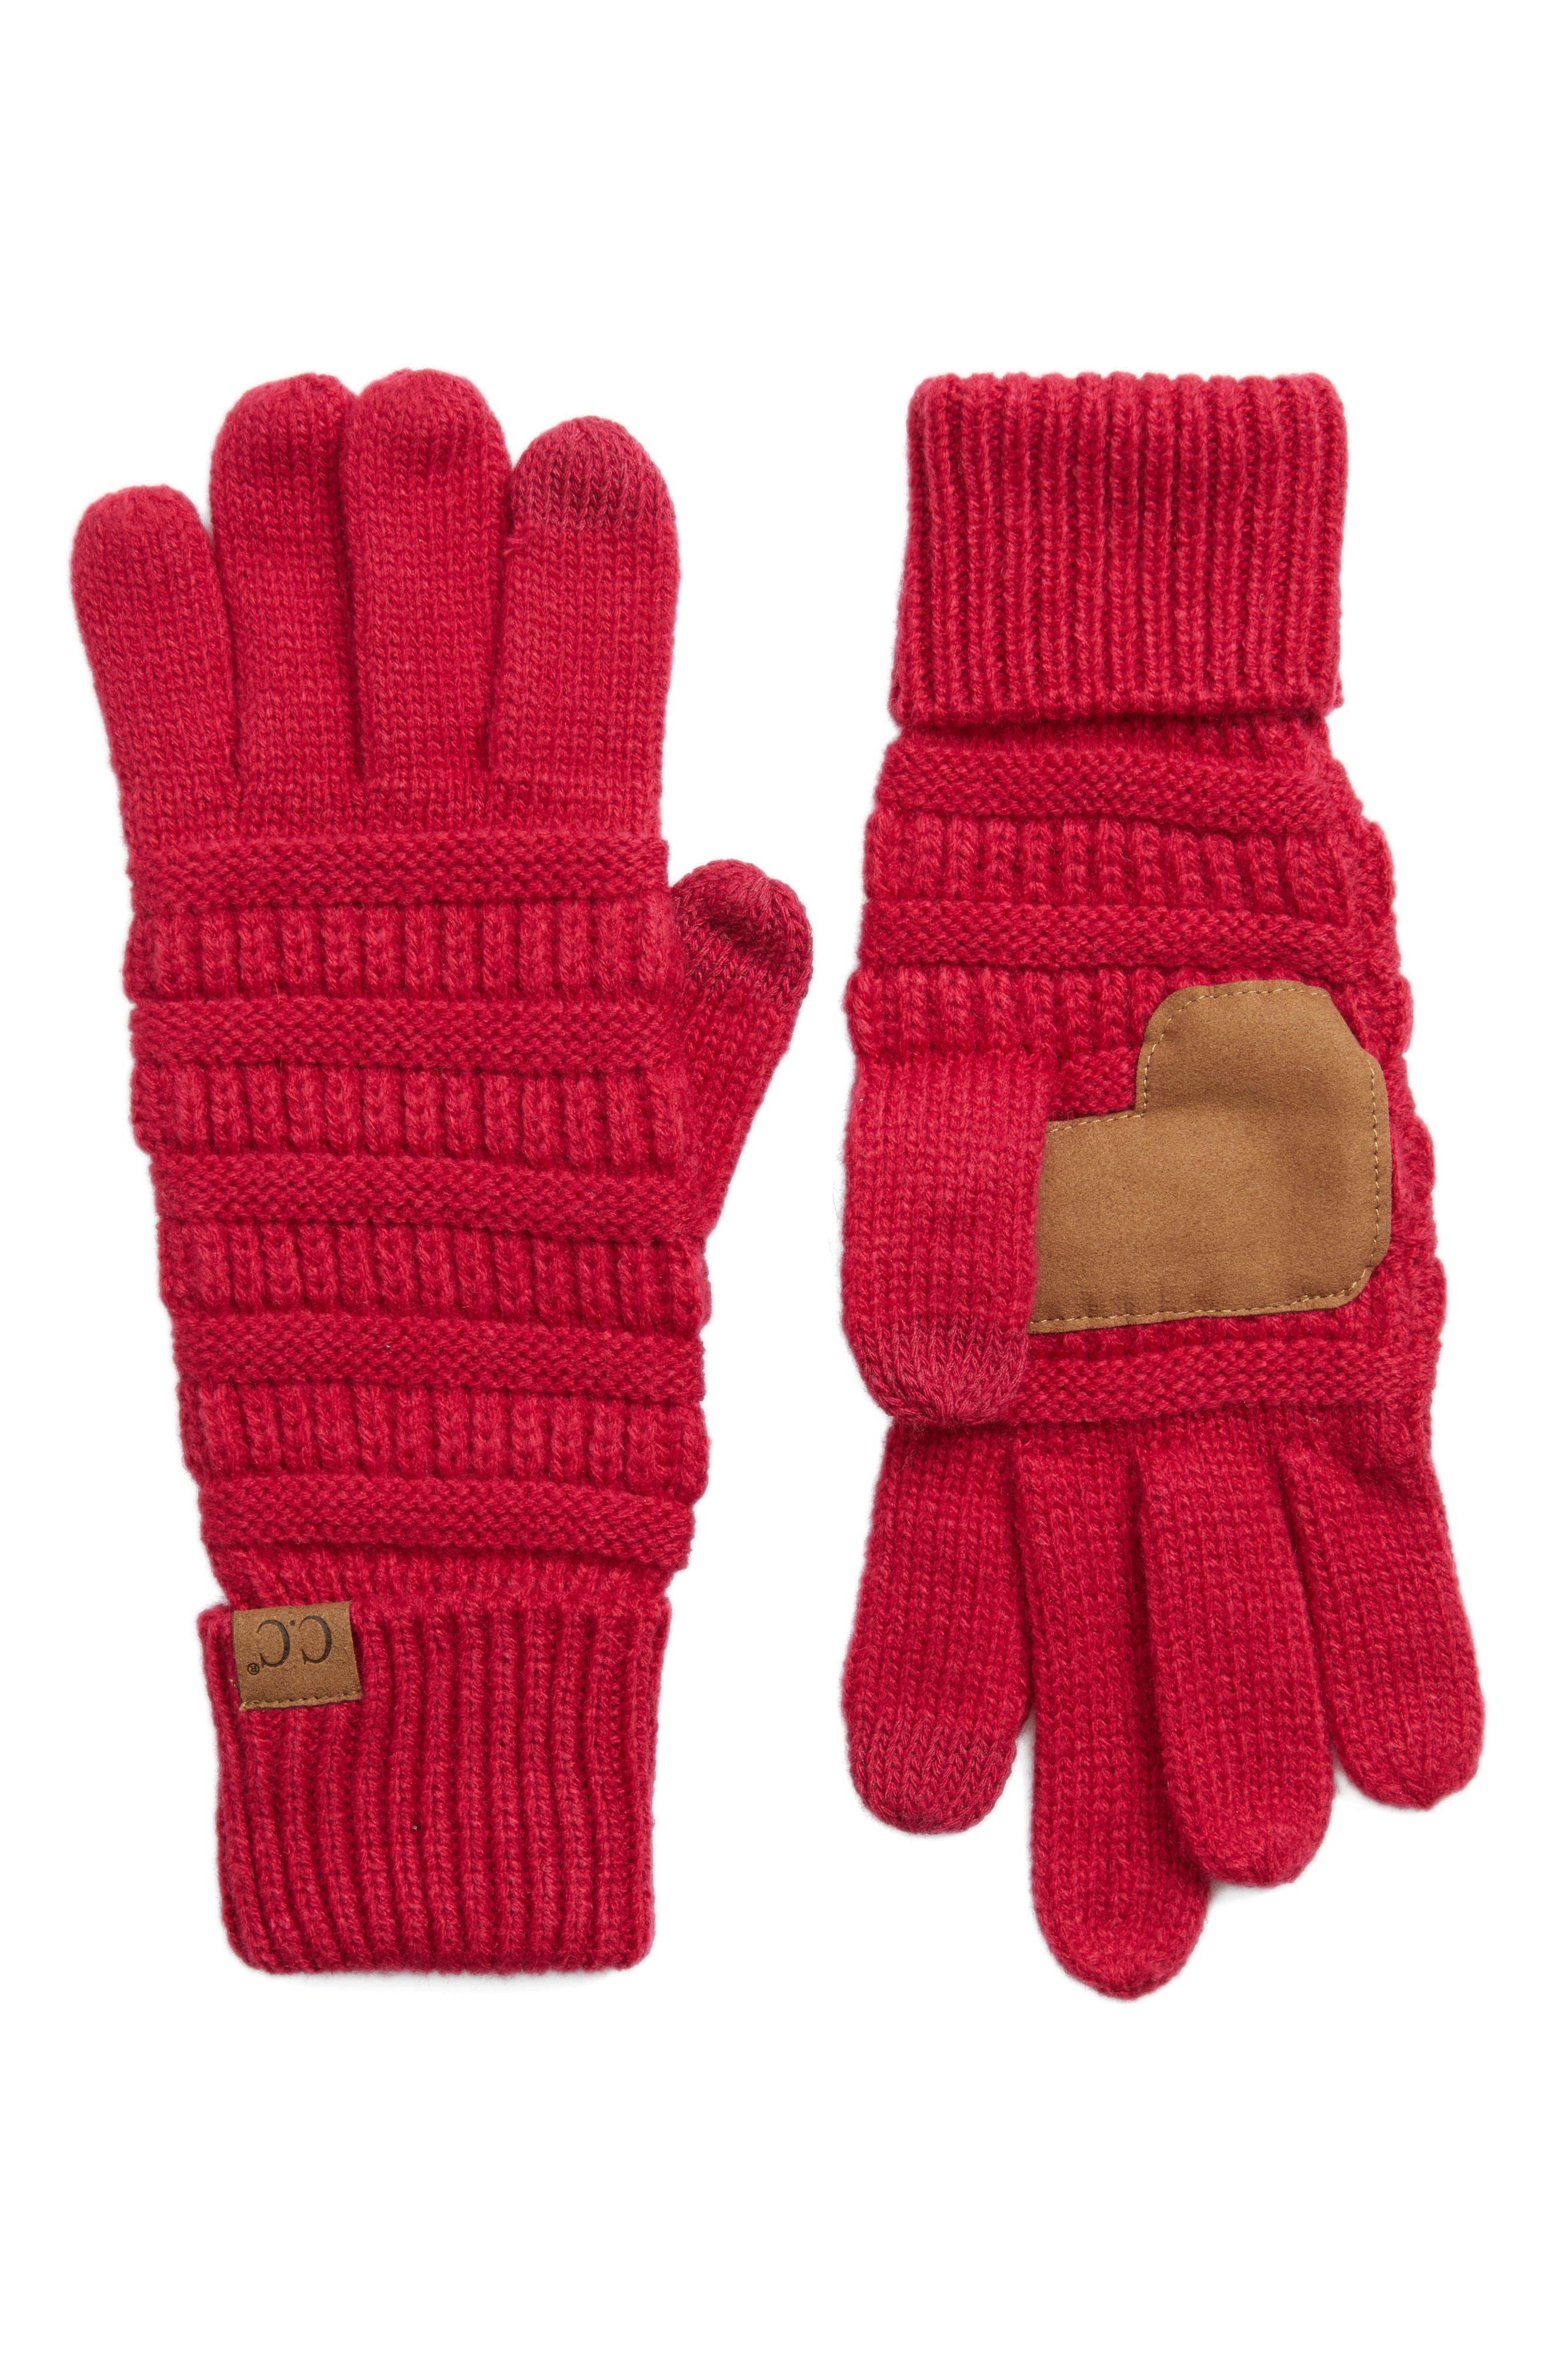 Rib Knit Tech Gloves,                             Main thumbnail 6, color,